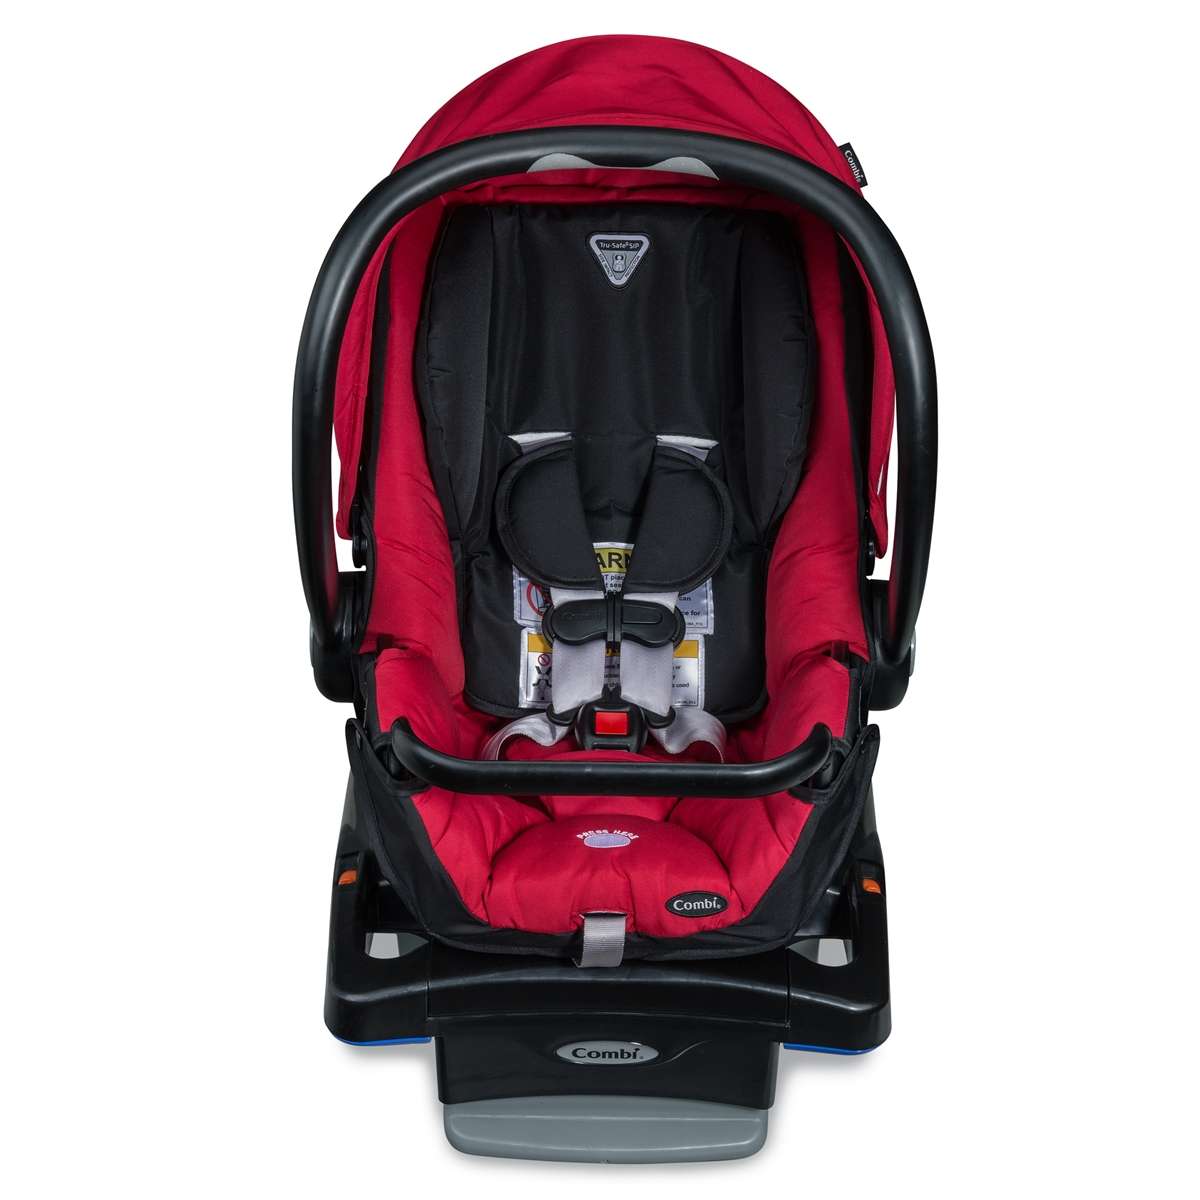 Brand New Titanium Free Shipping! Combi Shuttle 35 Infant Car Seat